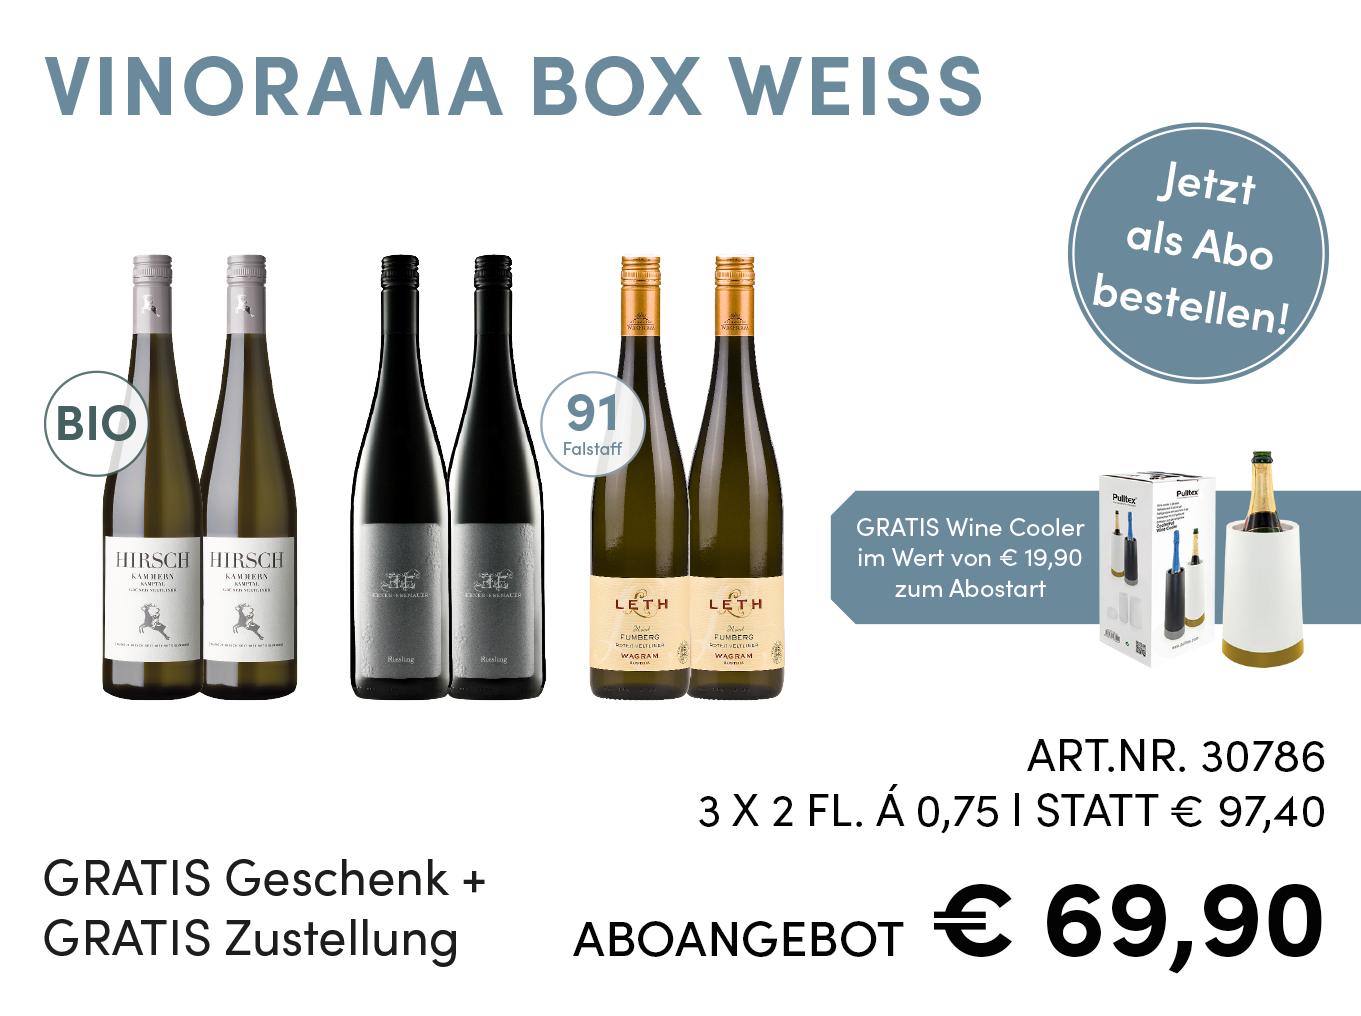 Vinorama Box Weiss Abo